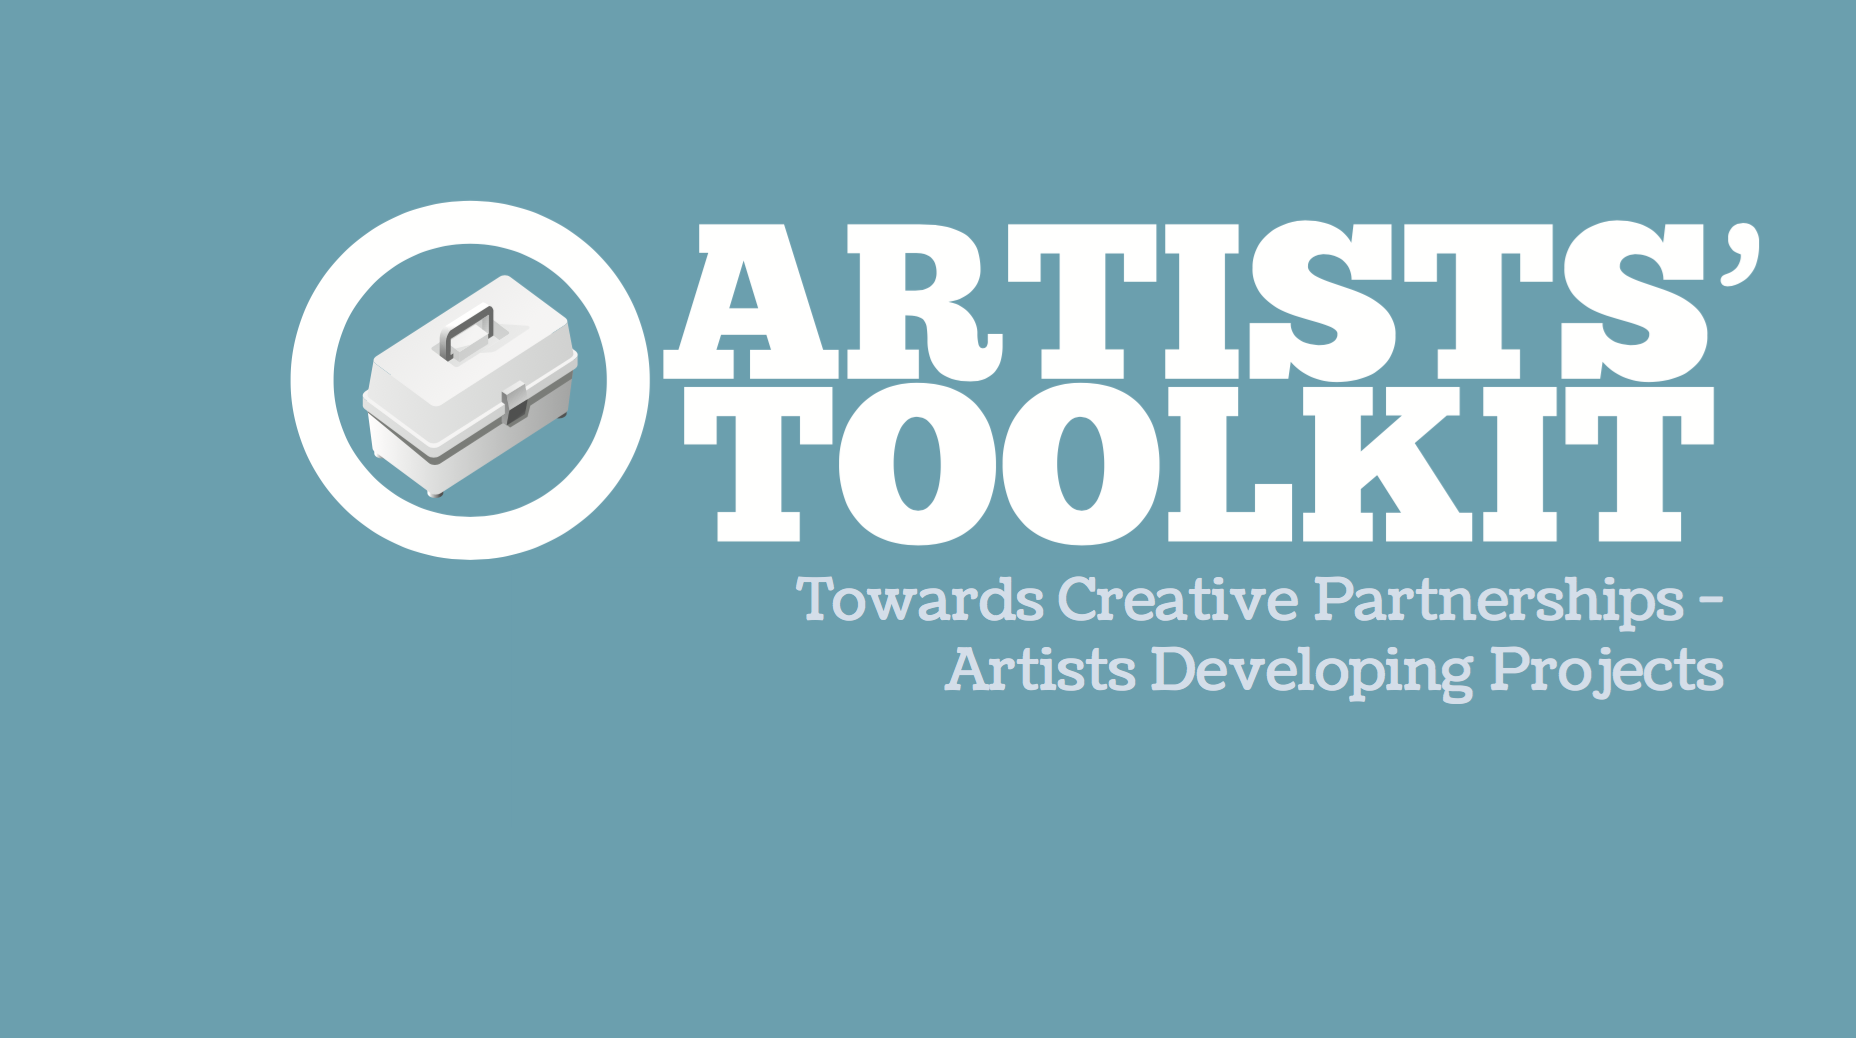 Artist and Partner Toolkit - Towards Creative Partnerships